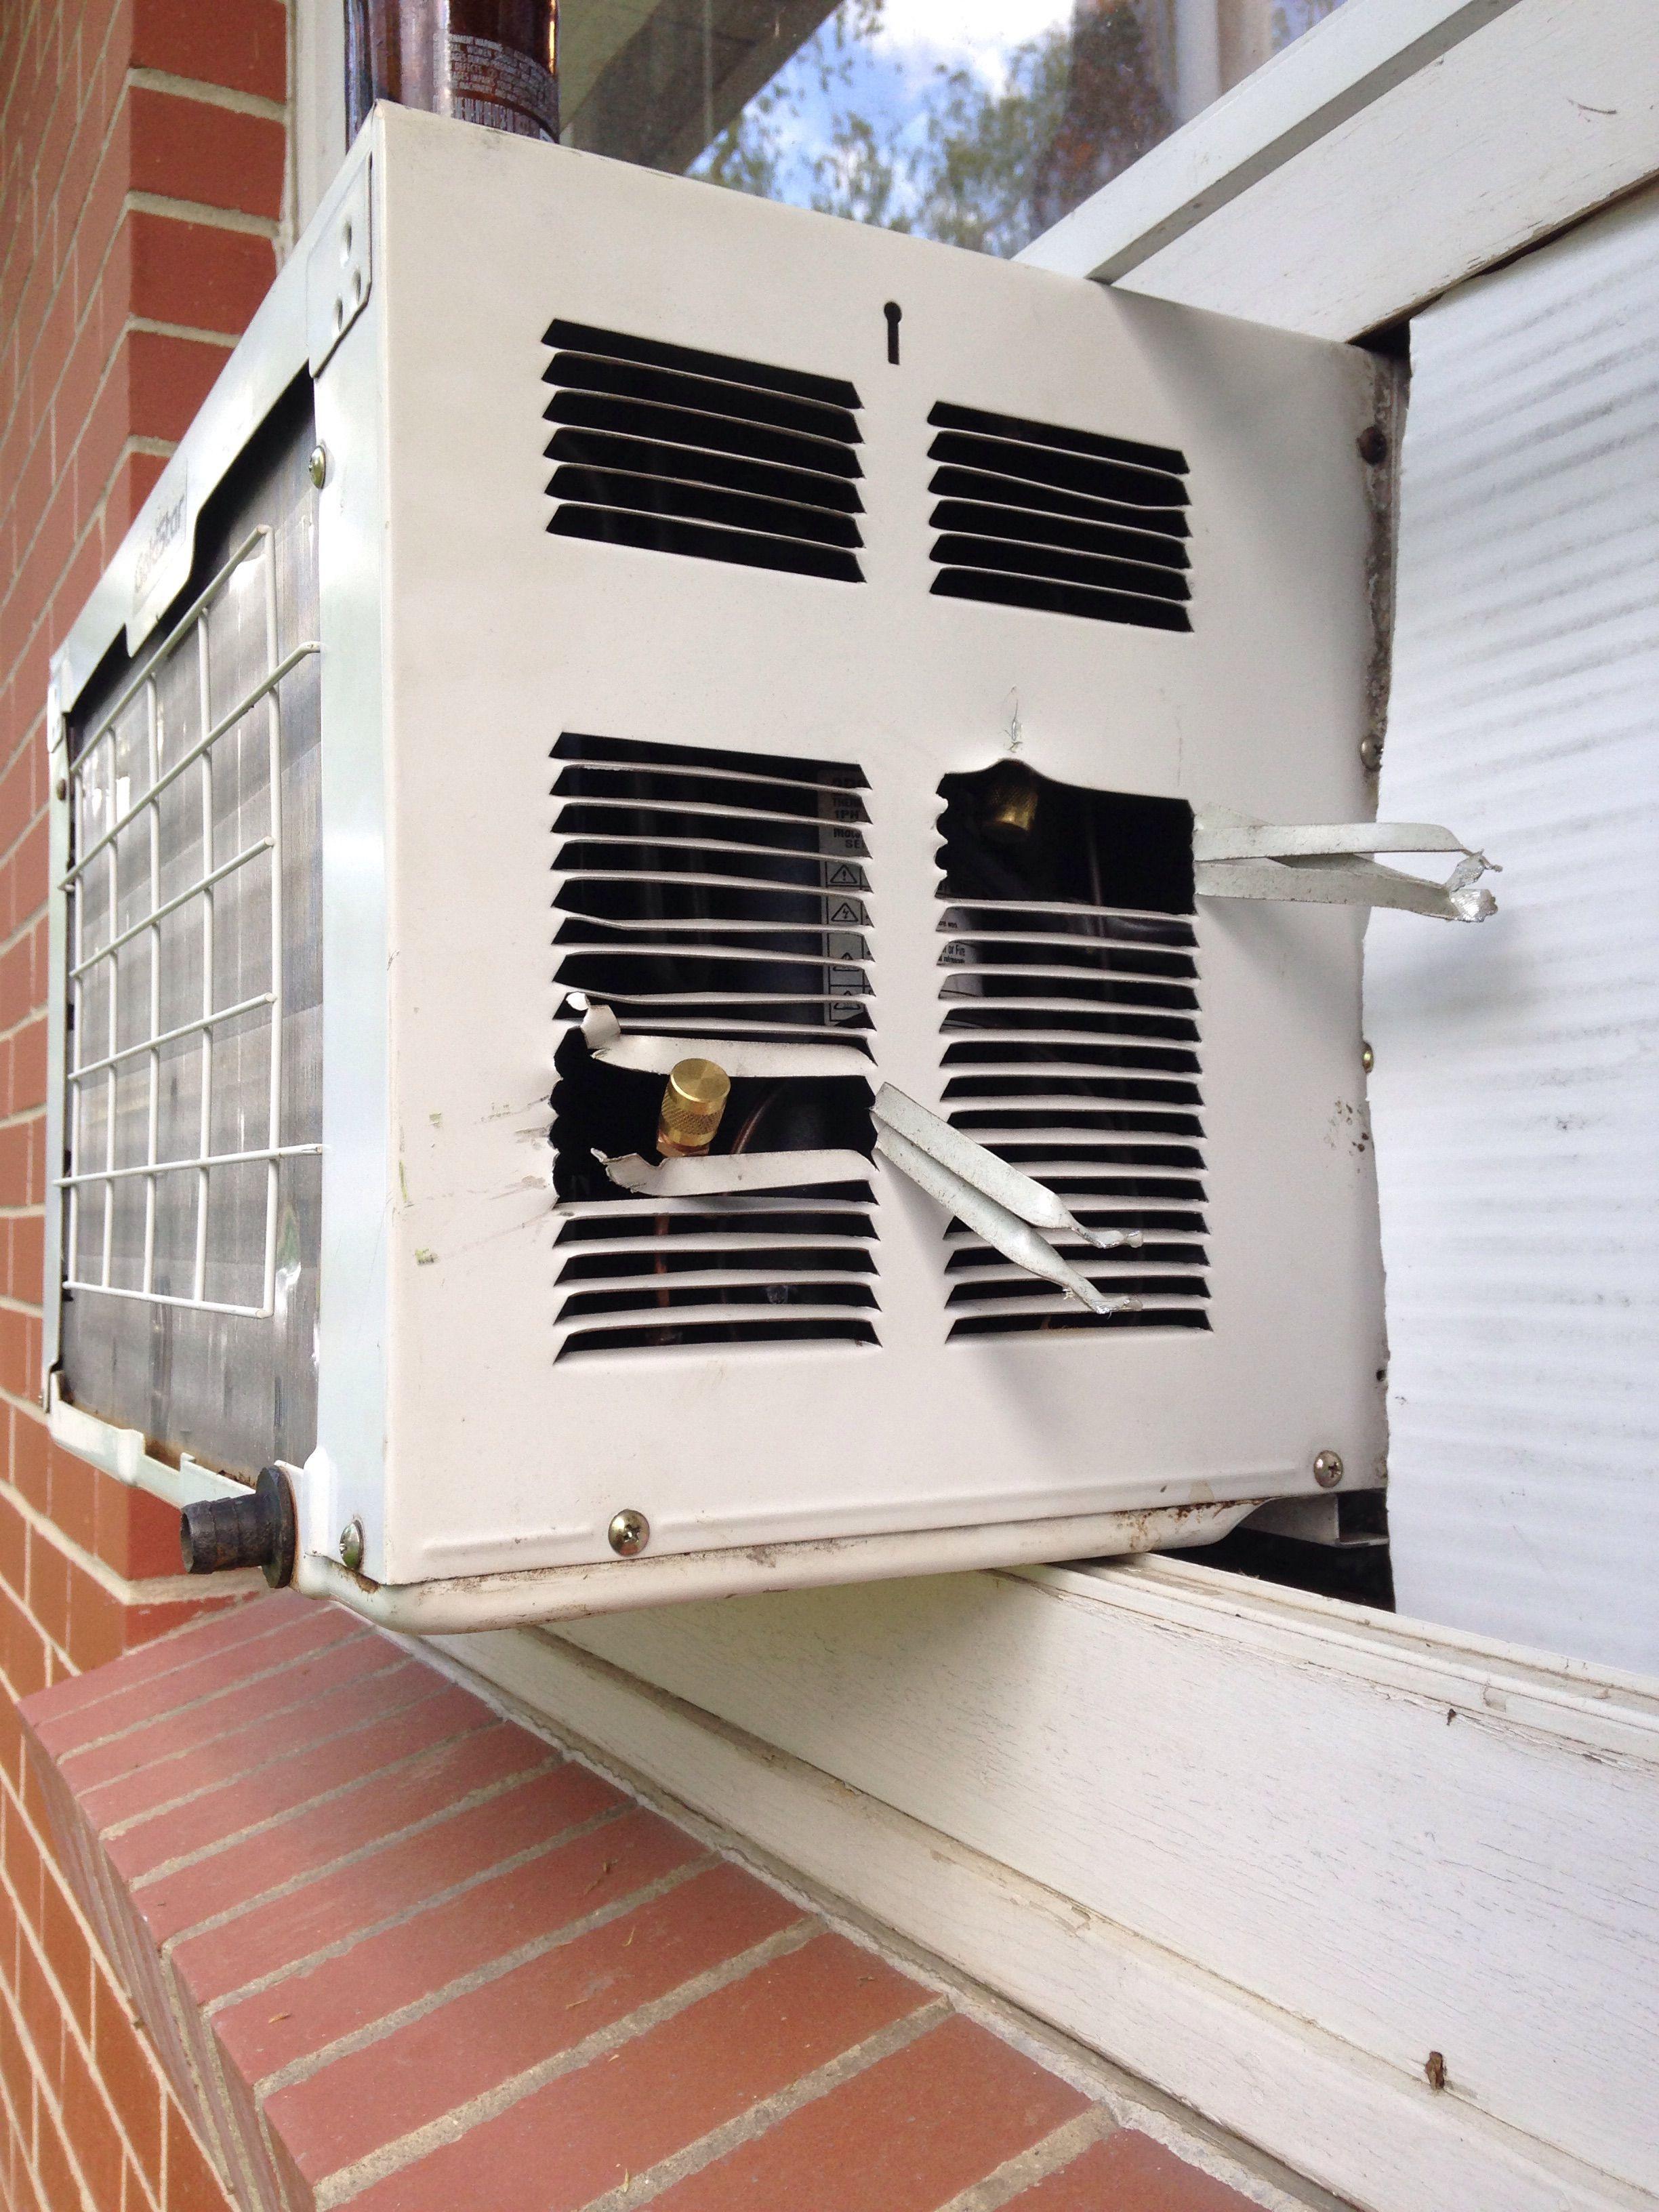 Window unit repairman Hvac hacks, Window unit, Hvac